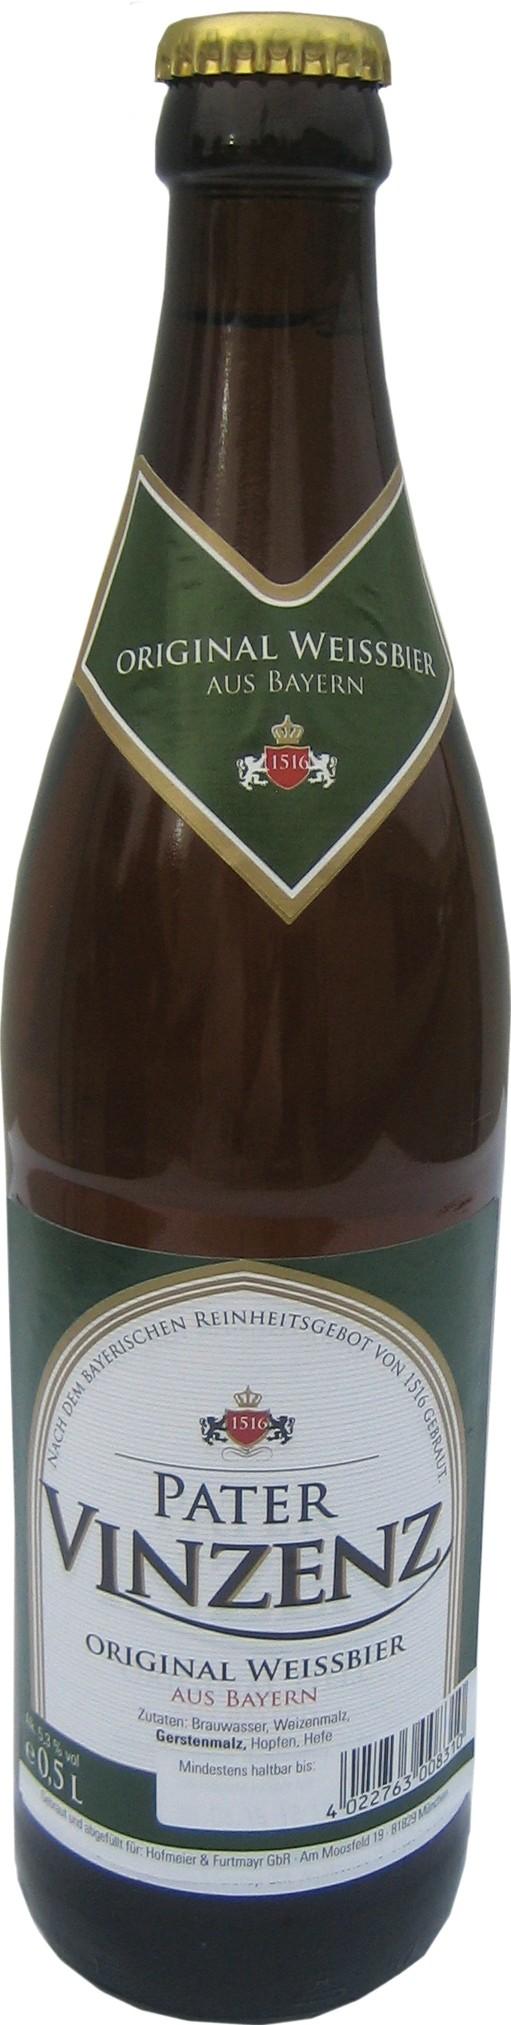 Pater Vinzenz Original Weißbier